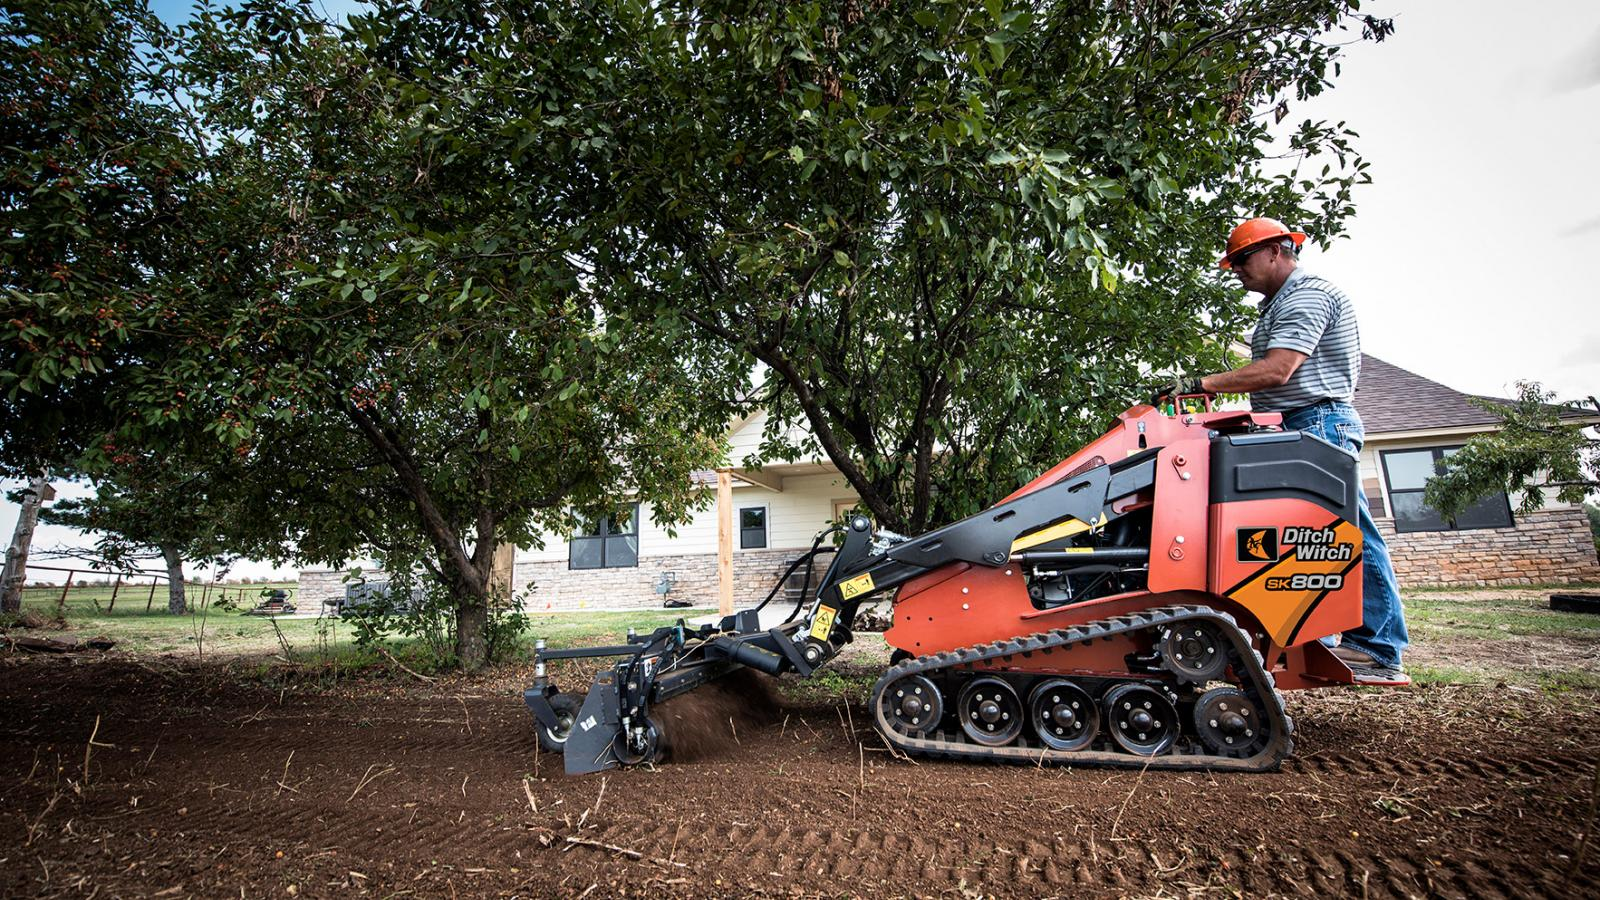 Tree Removal Equipment: 8 Helpful Things